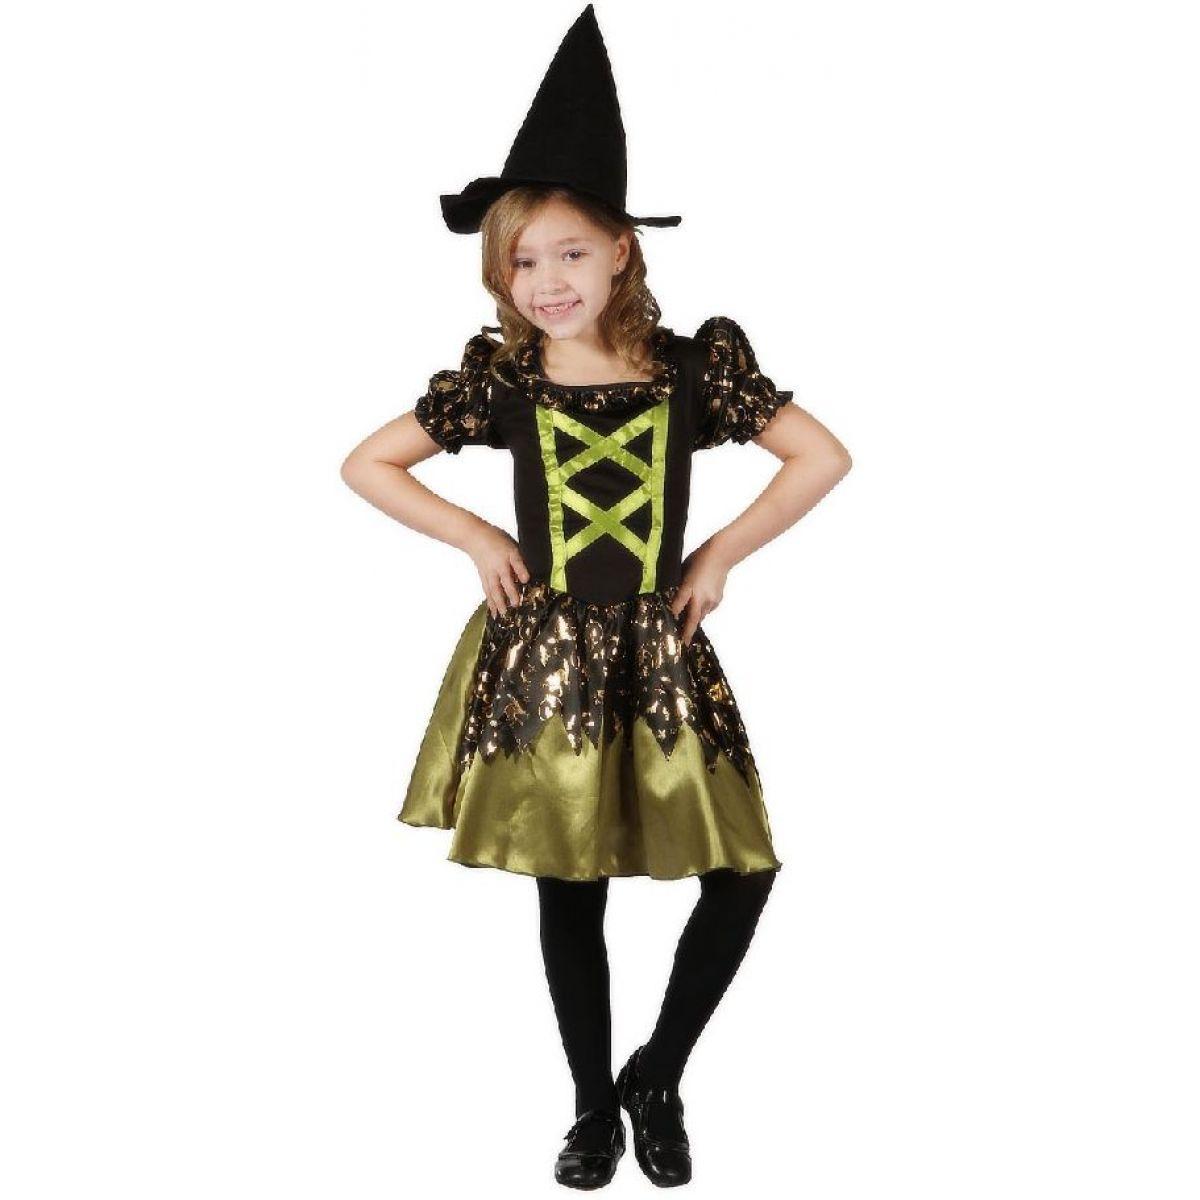 Made Dětský kostým Čarodějka zelená 110-120cm MaDe